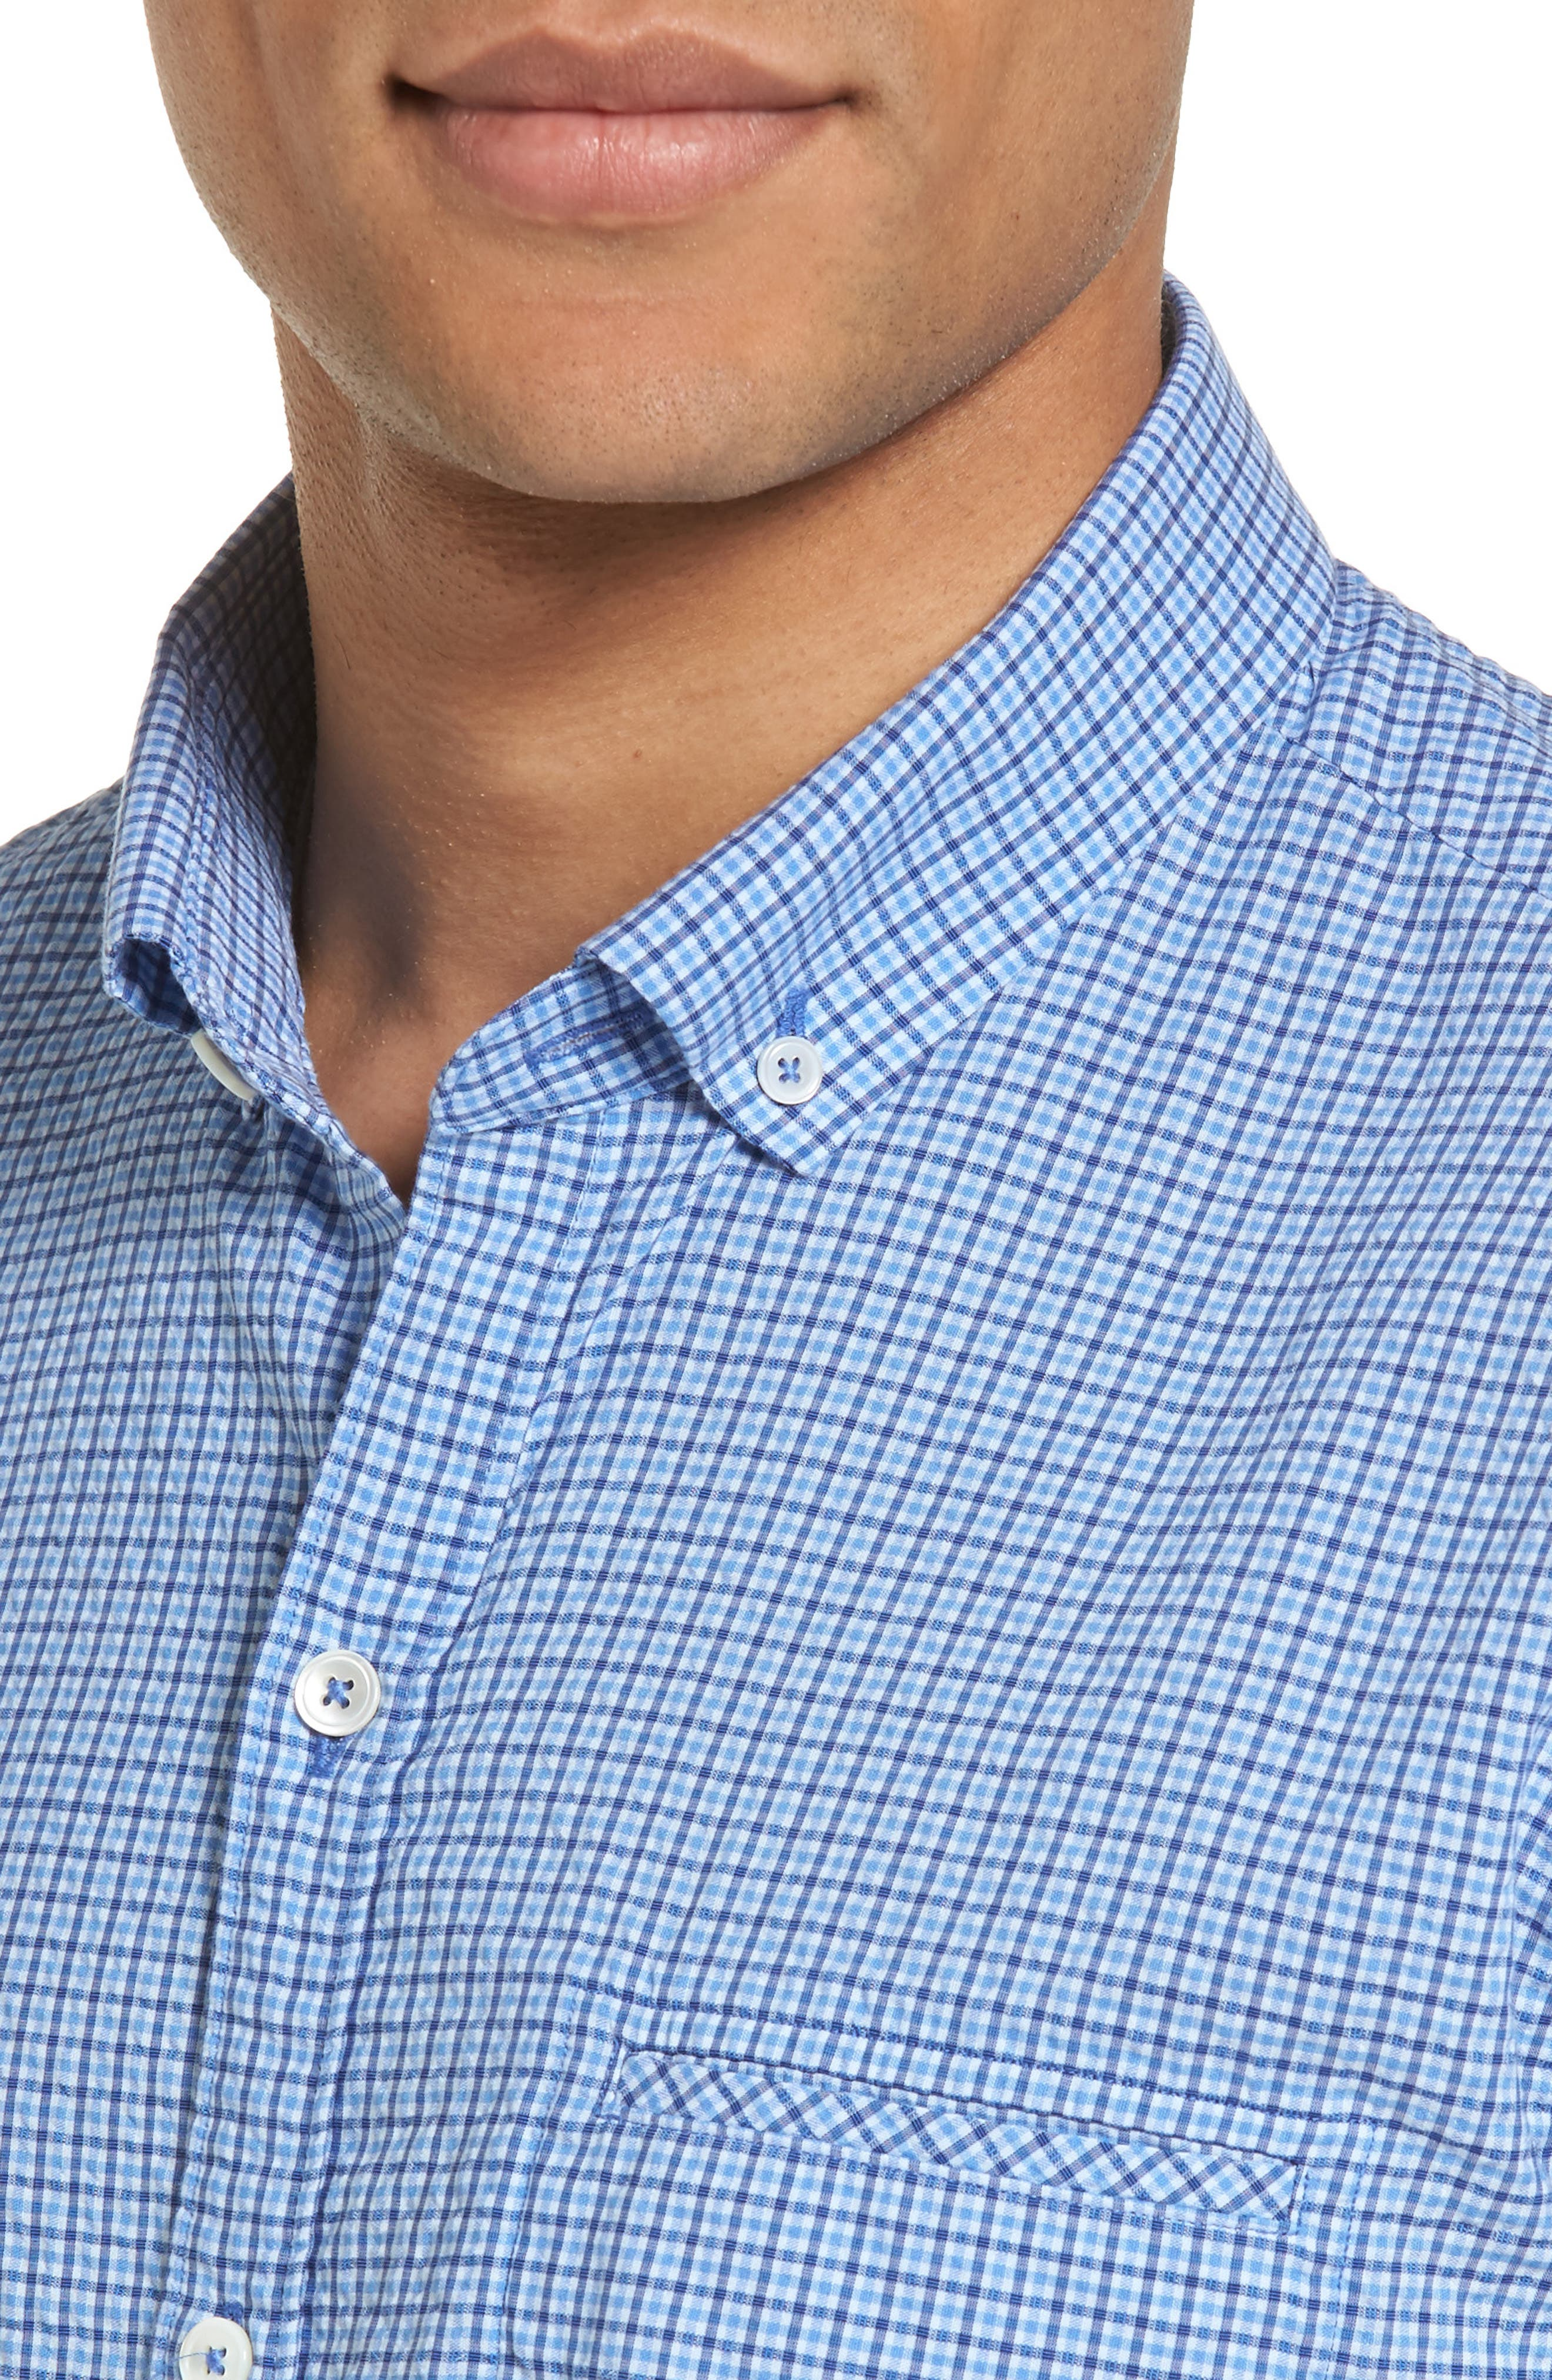 Short Sleeve Sport Shirt,                             Alternate thumbnail 4, color,                             Teal